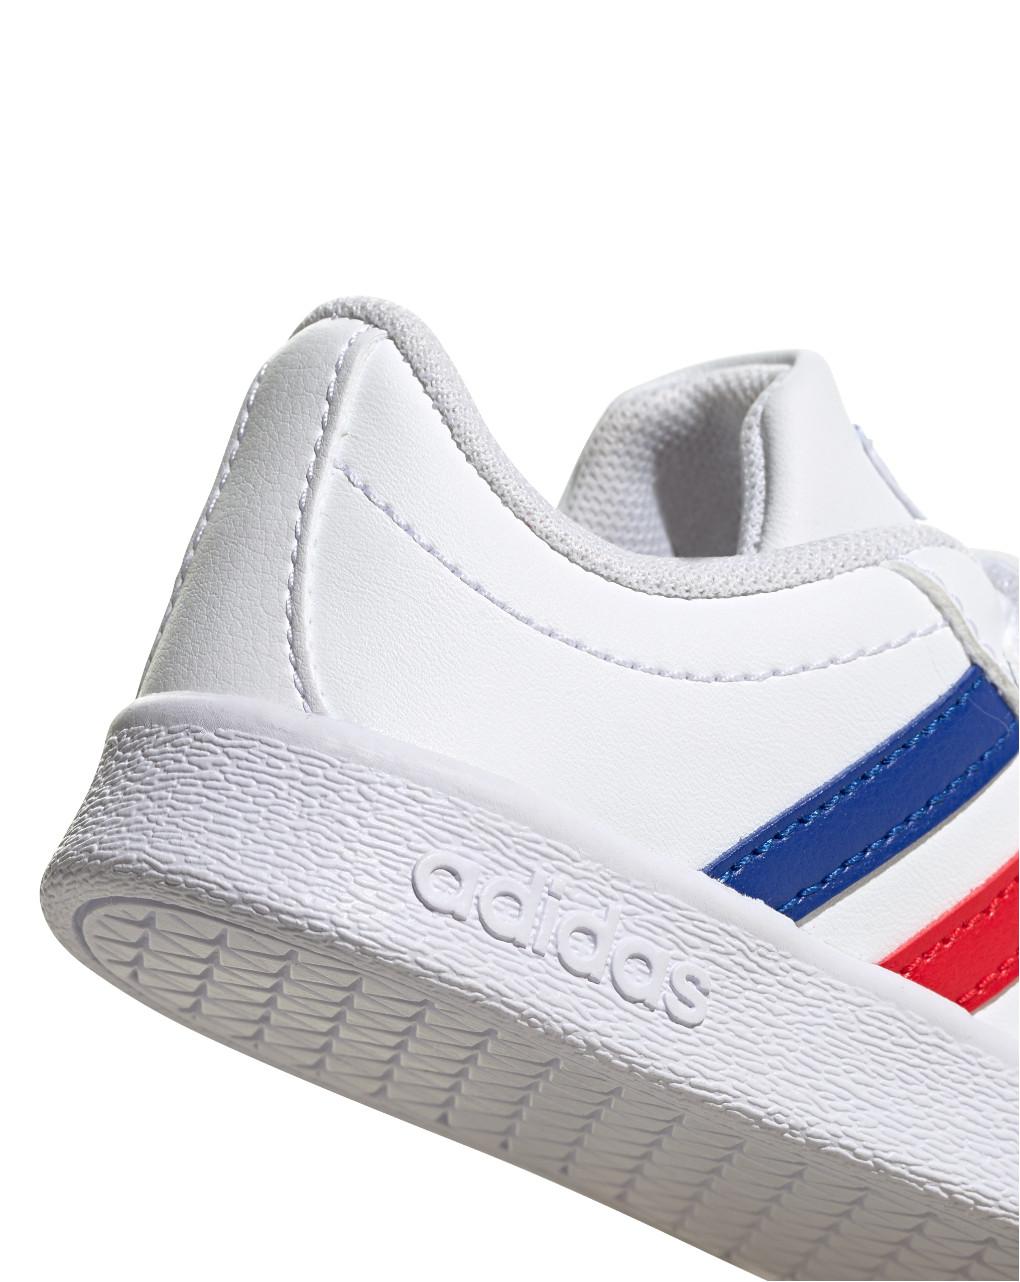 Vl court 2.0 cmf i - Nike